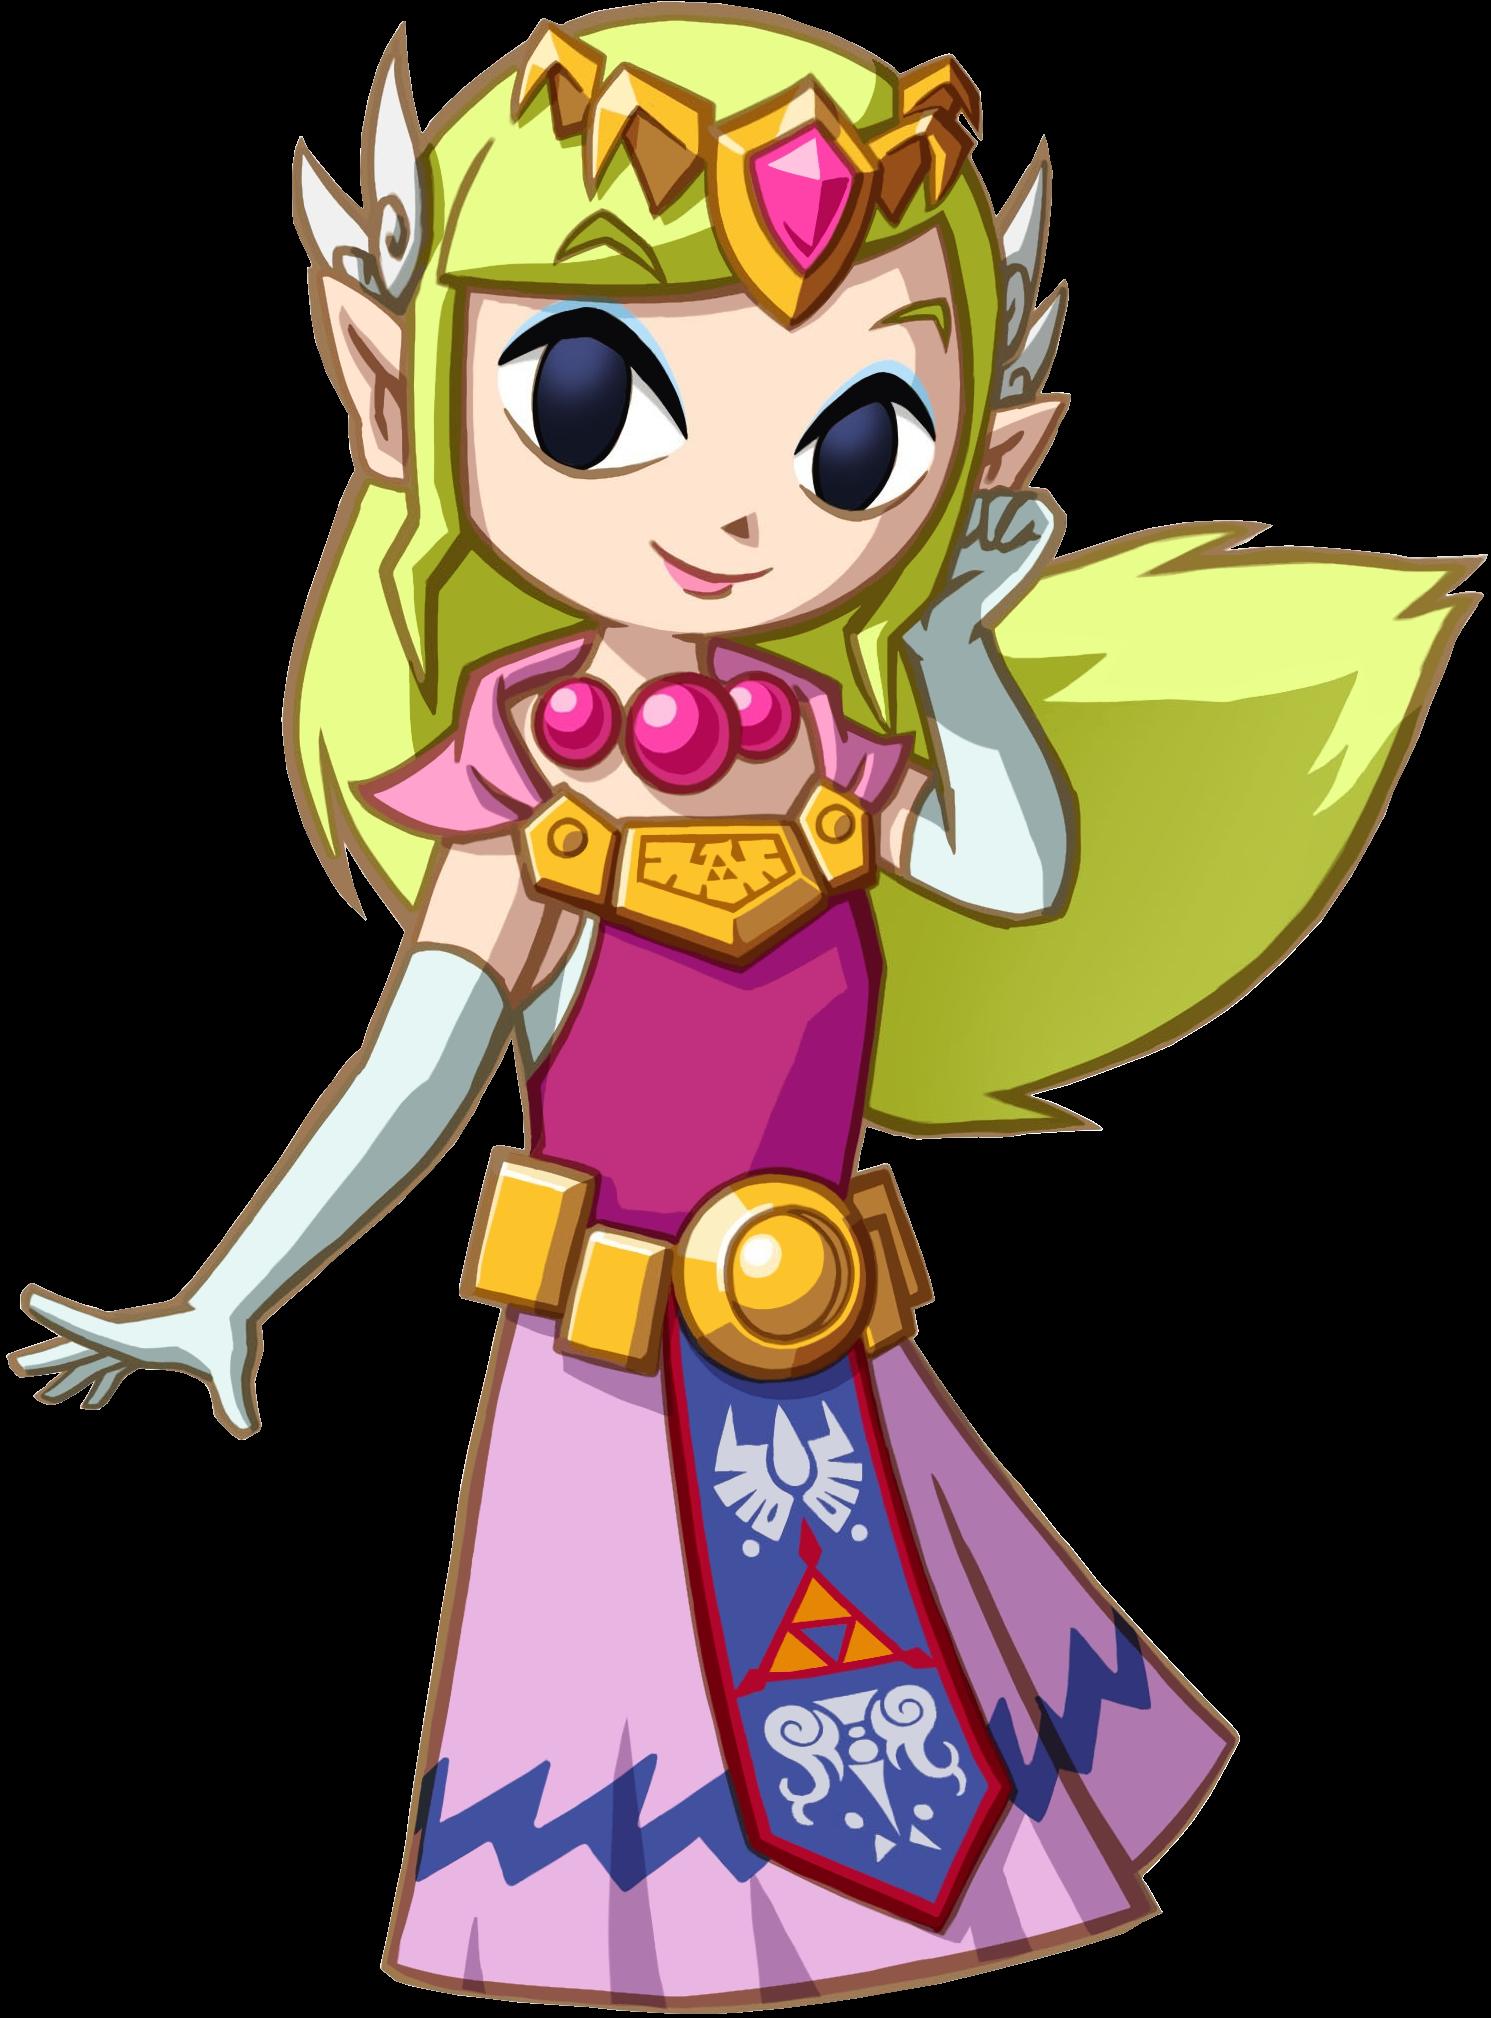 Image princesse zelda zeldawiki fandom - La princesse zelda ...